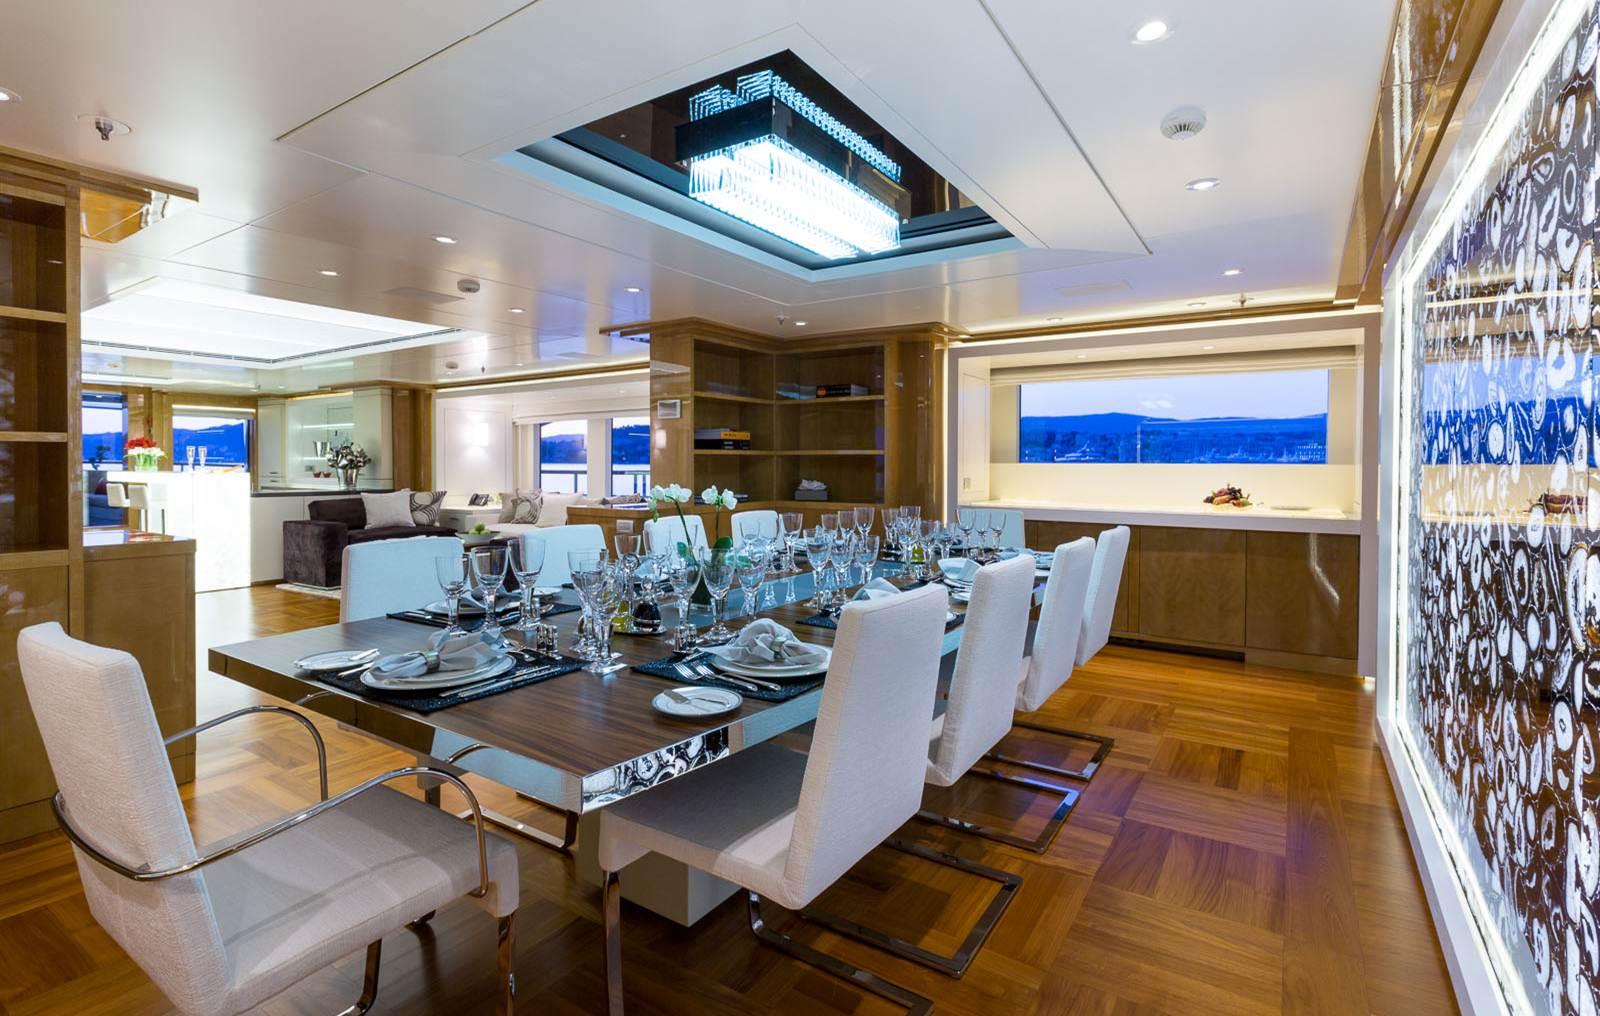 Superyachten interieur  Formal Image Gallery – Luxury Yacht Browser   by CHARTERWORLD ...